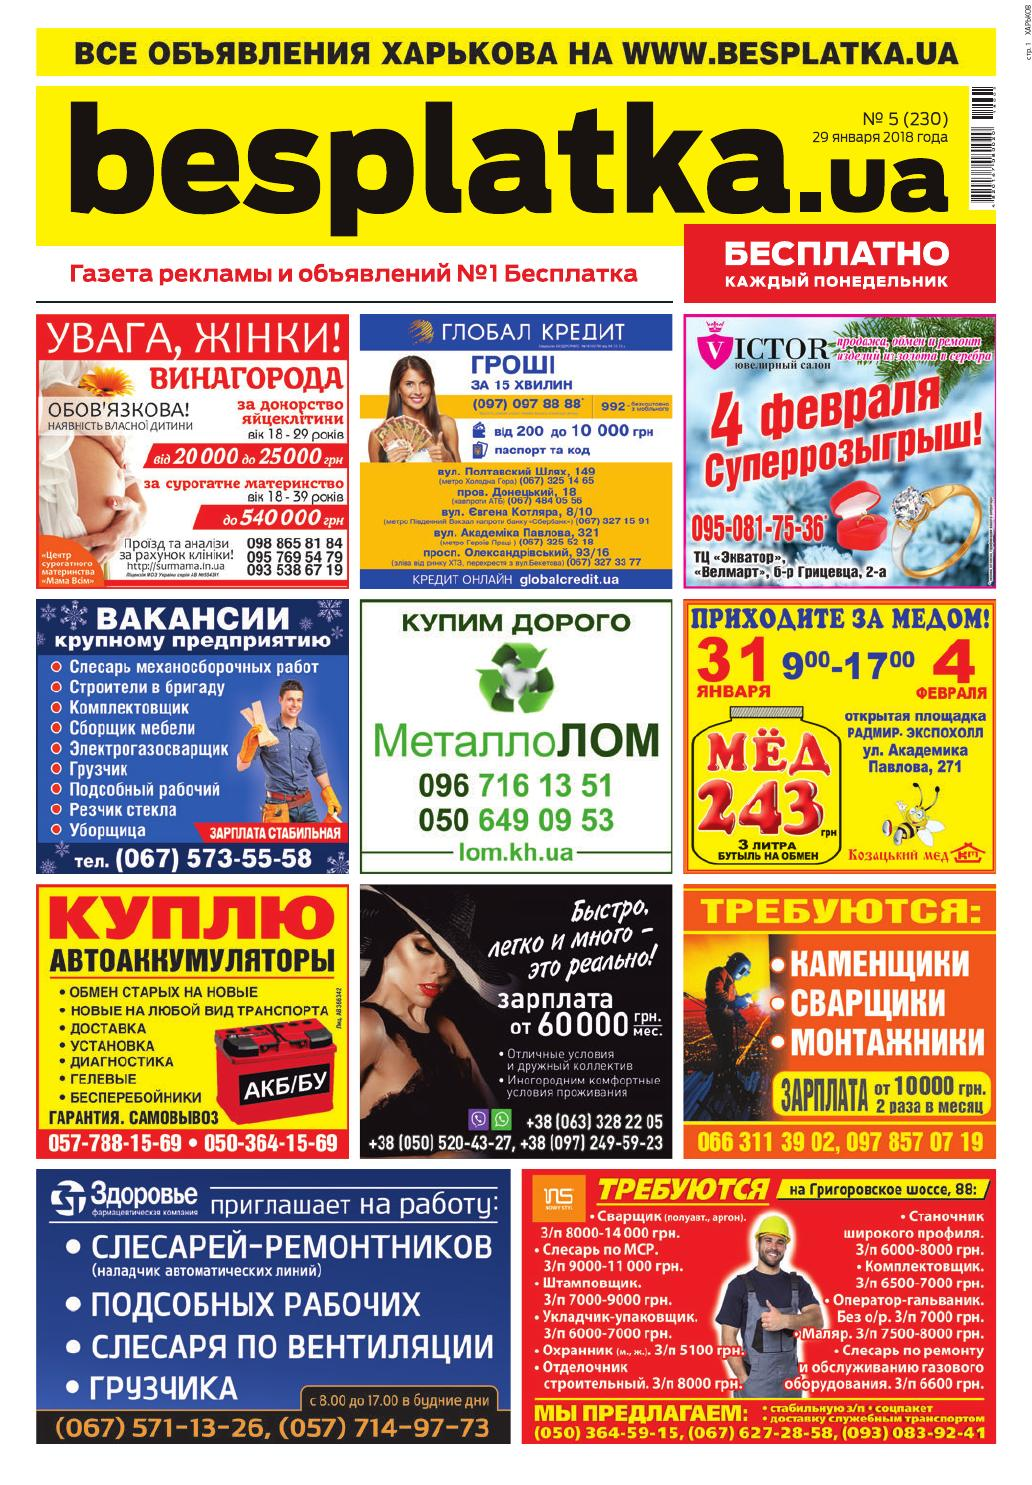 Besplatka  5 Харьков by besplatka ukraine - issuu 60d58fb253c